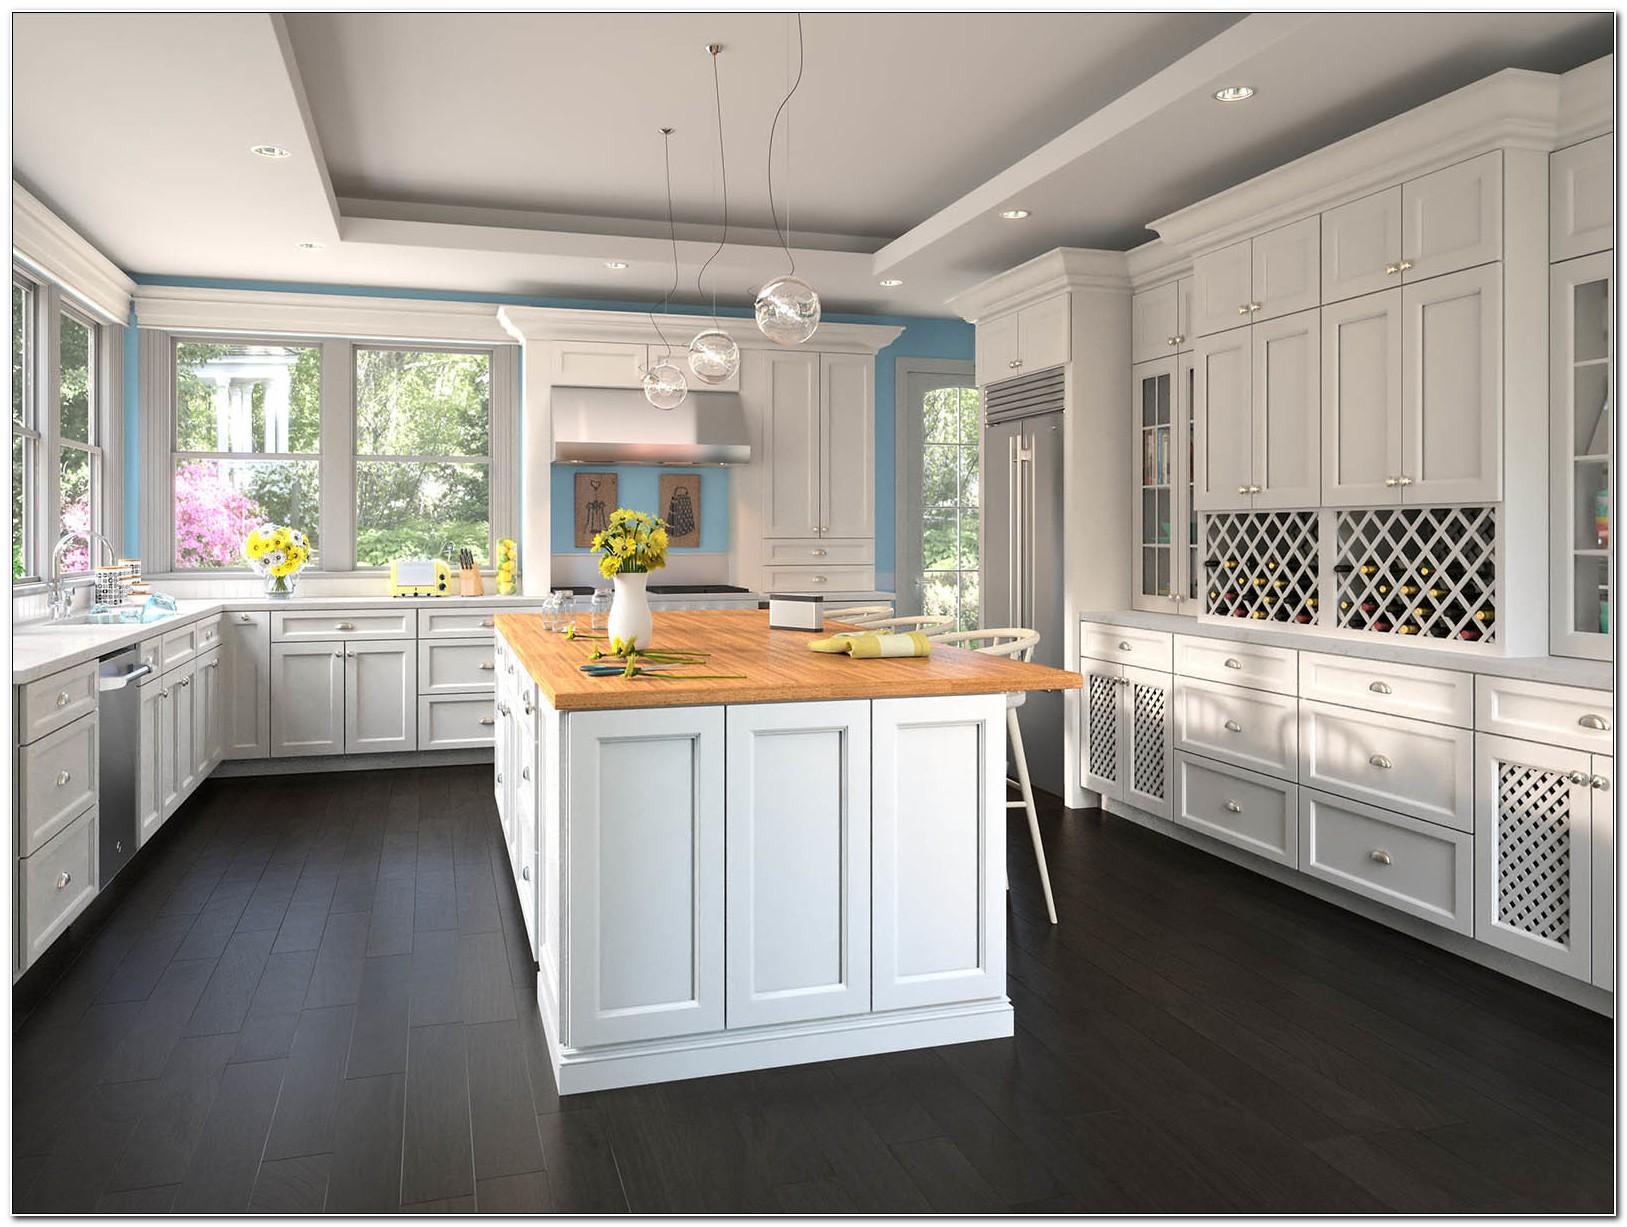 Kitchen Cabinets West Melbourne Fl